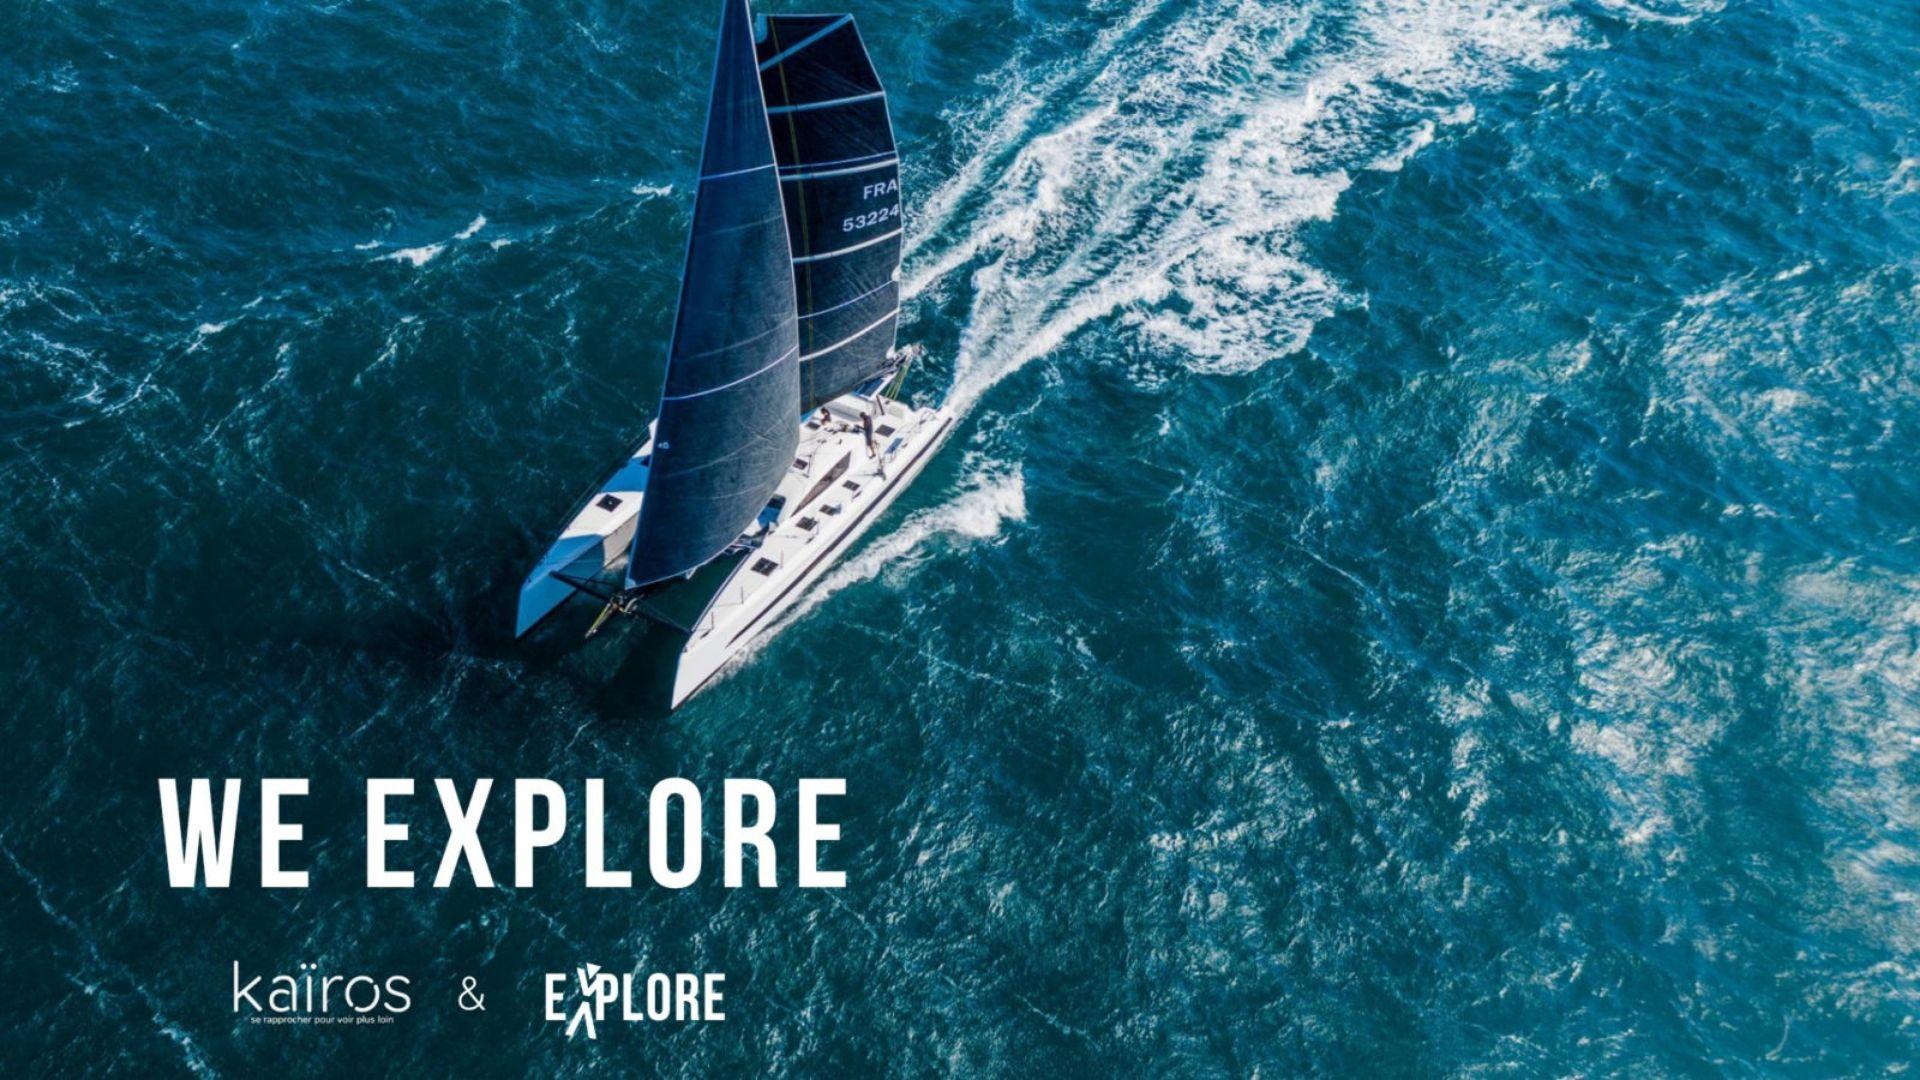 catamaran we explore fibre de lin écologique innovation biomatériaux